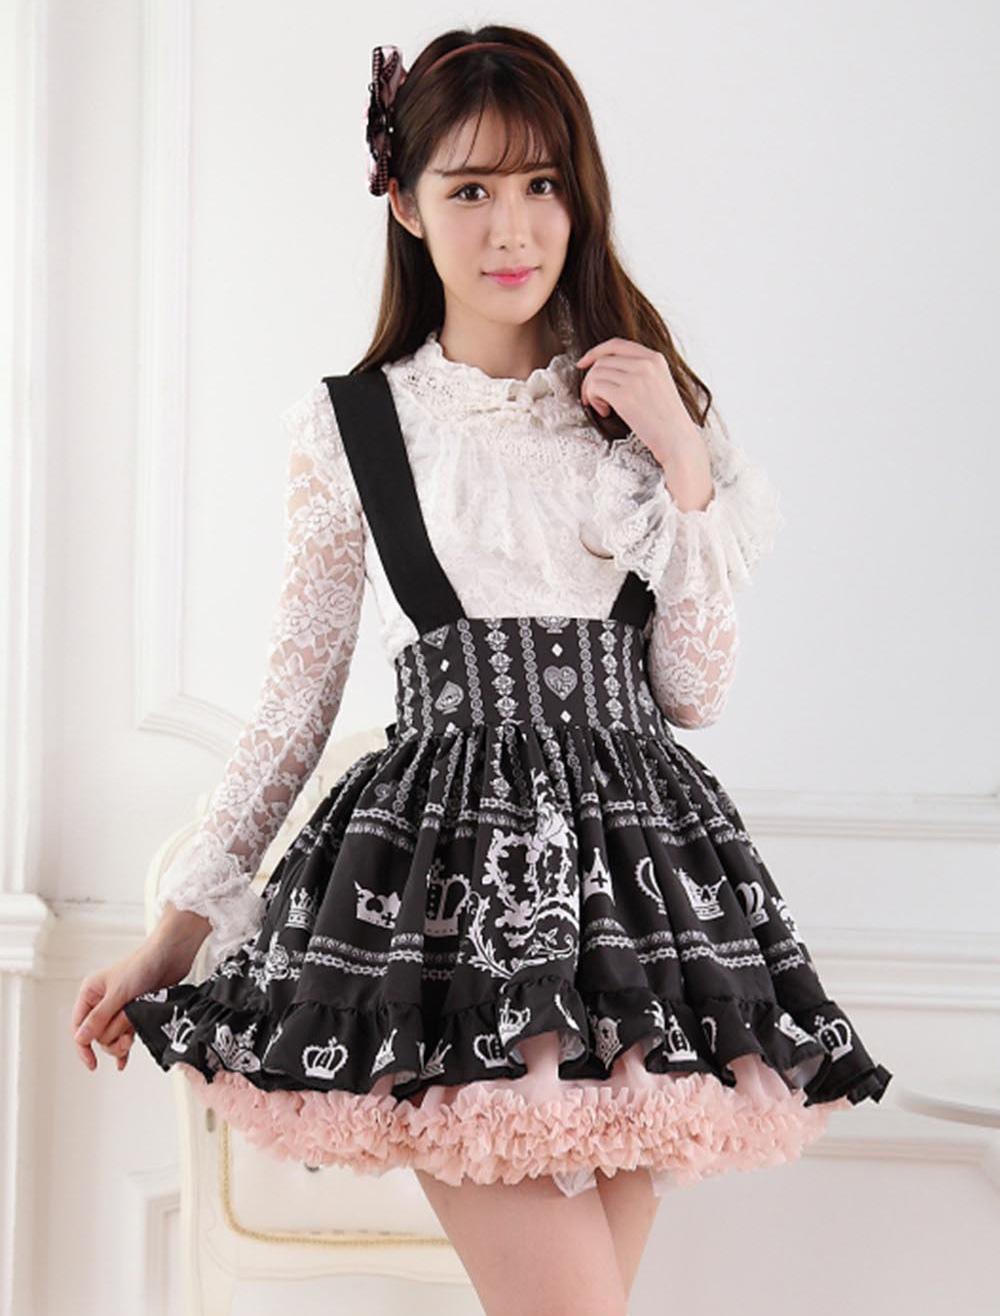 Black Lolita Skirt Salopette Crown Print Lace Lining